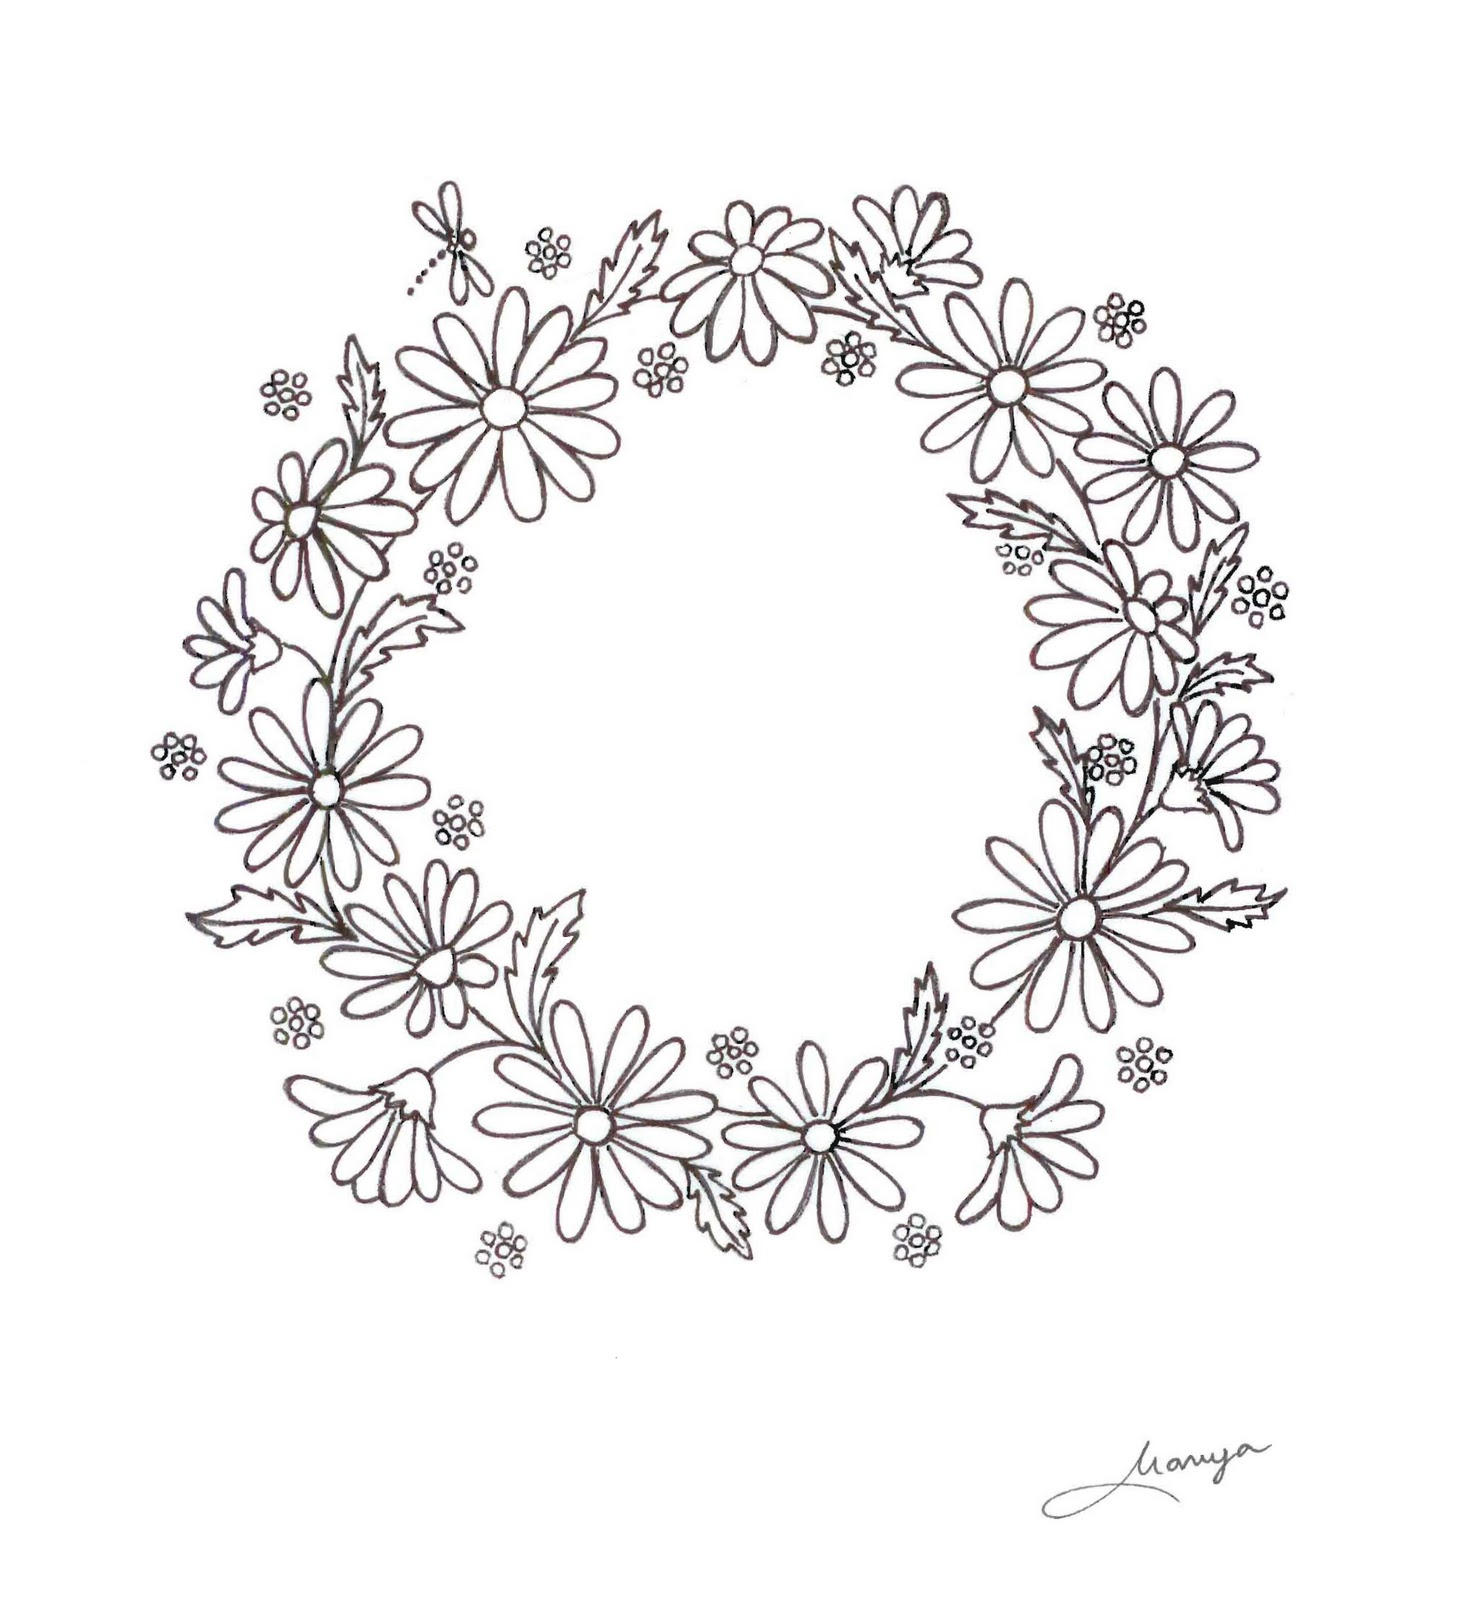 Humming Needles Daisy Wreath Design